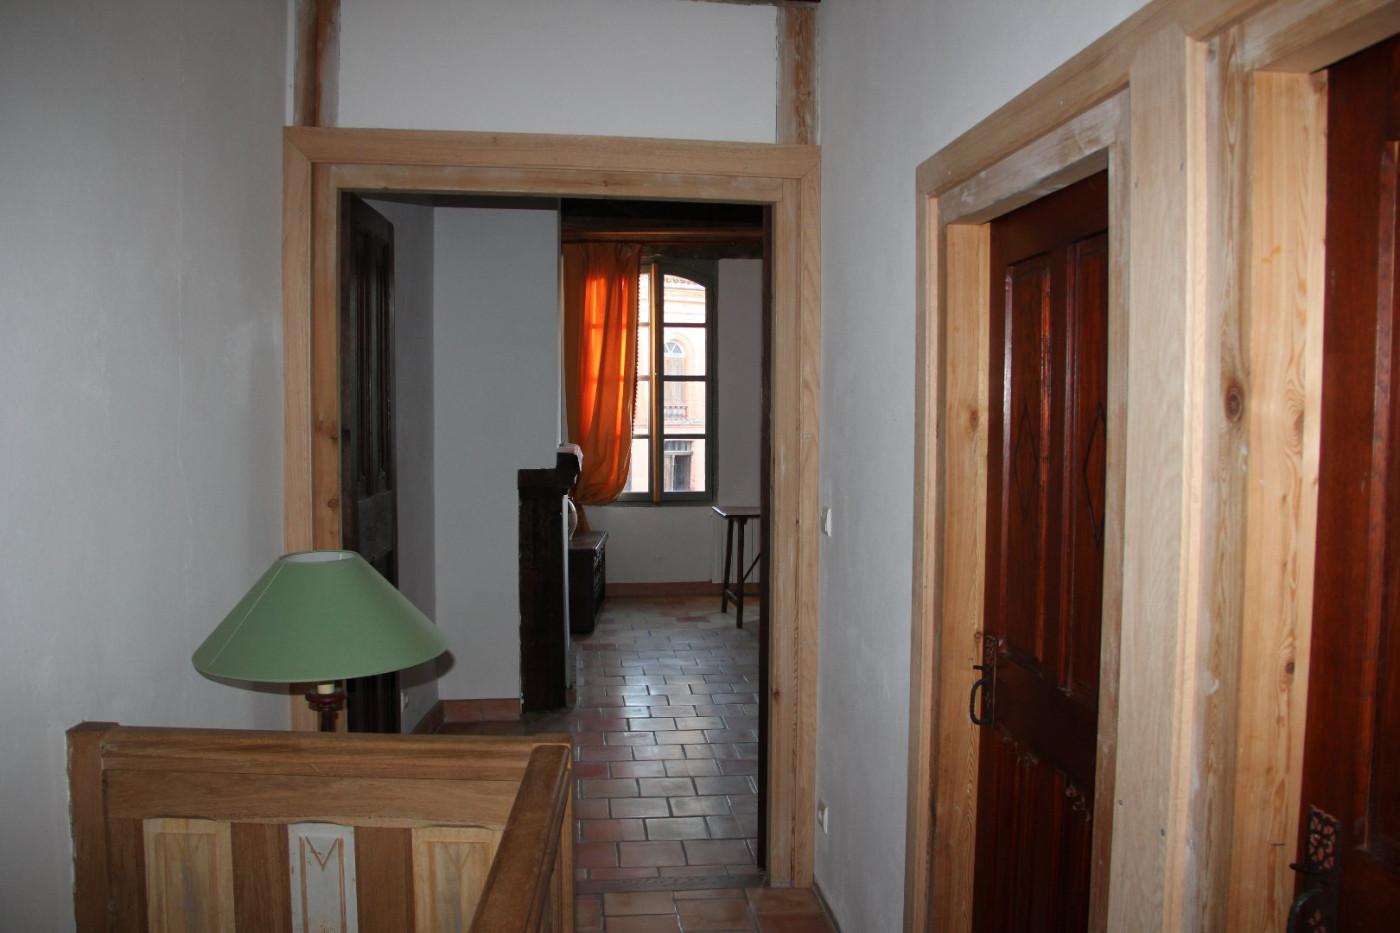 A vendre  Samatan | Réf 320071917 - L'occitane immobilier